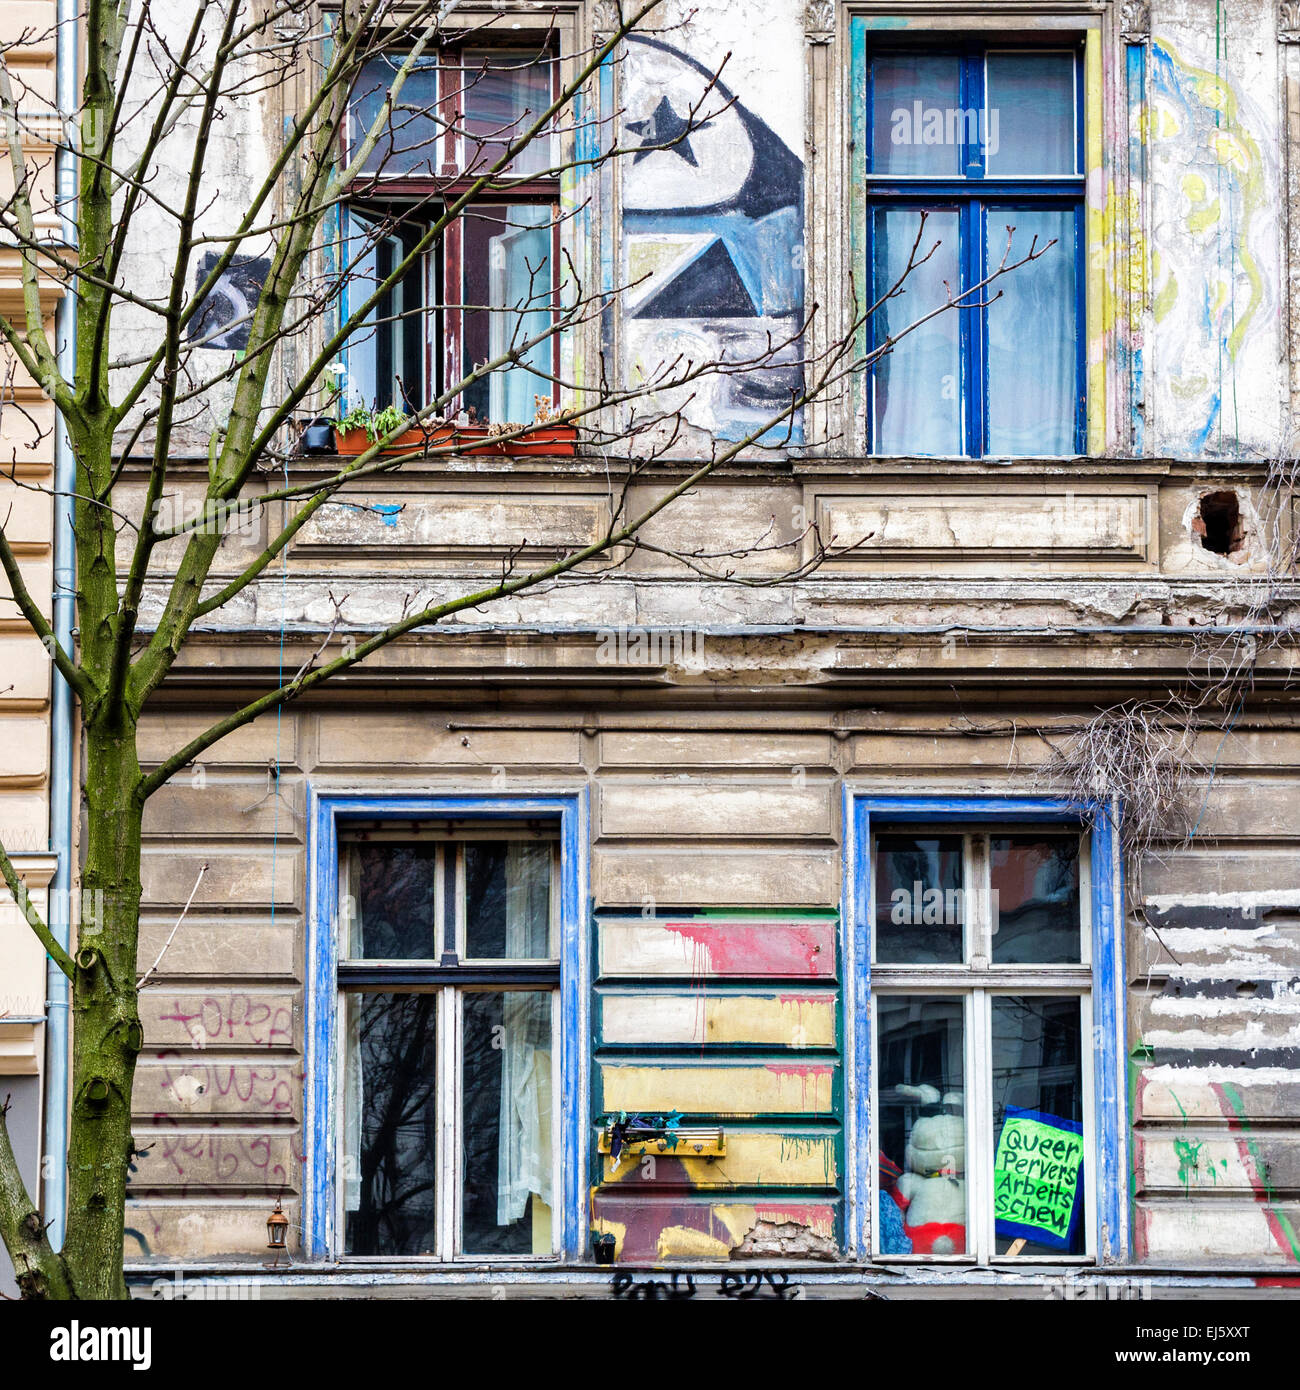 Kastanienallee 86, KA-86, alte hocken Exterieur, Fassade, Fenster und Graffiti, Mitte, Berlin Stockbild